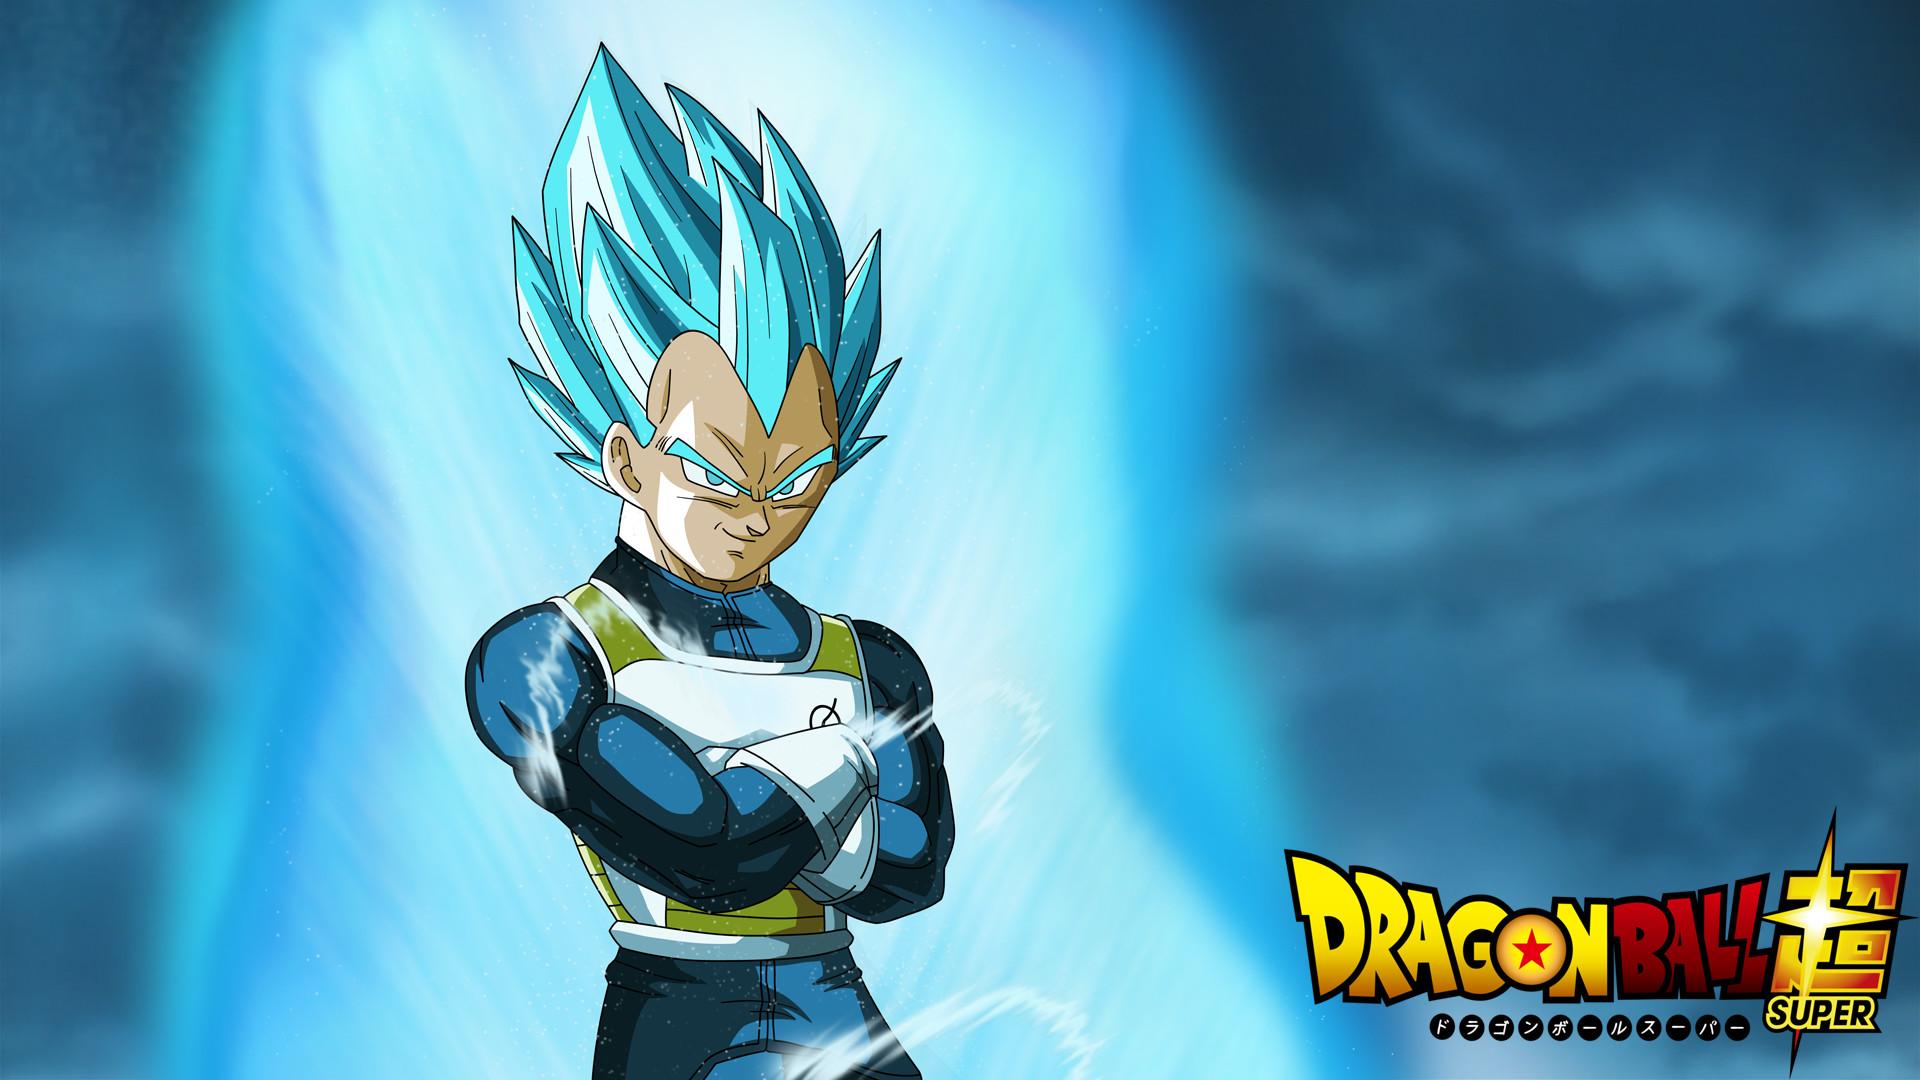 109 Vegeta (Dragon Ball) HD Wallpapers